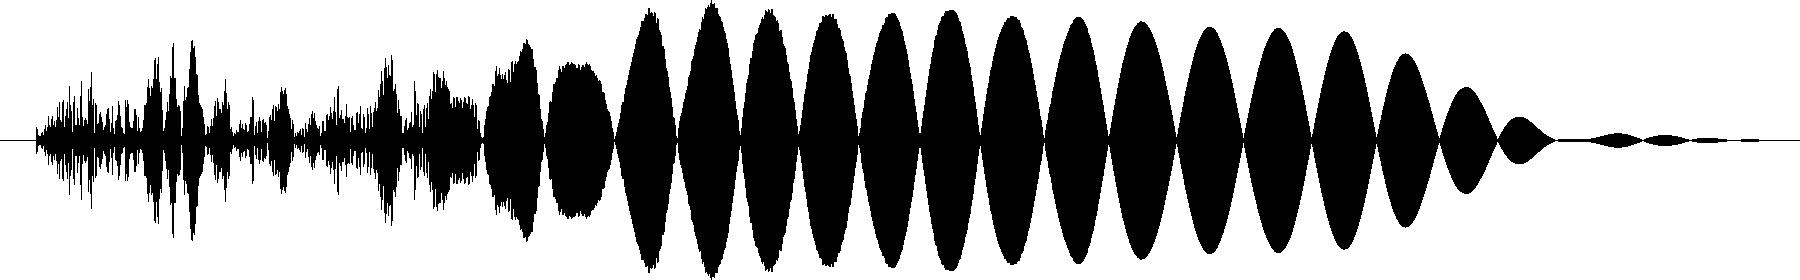 perc 1 36